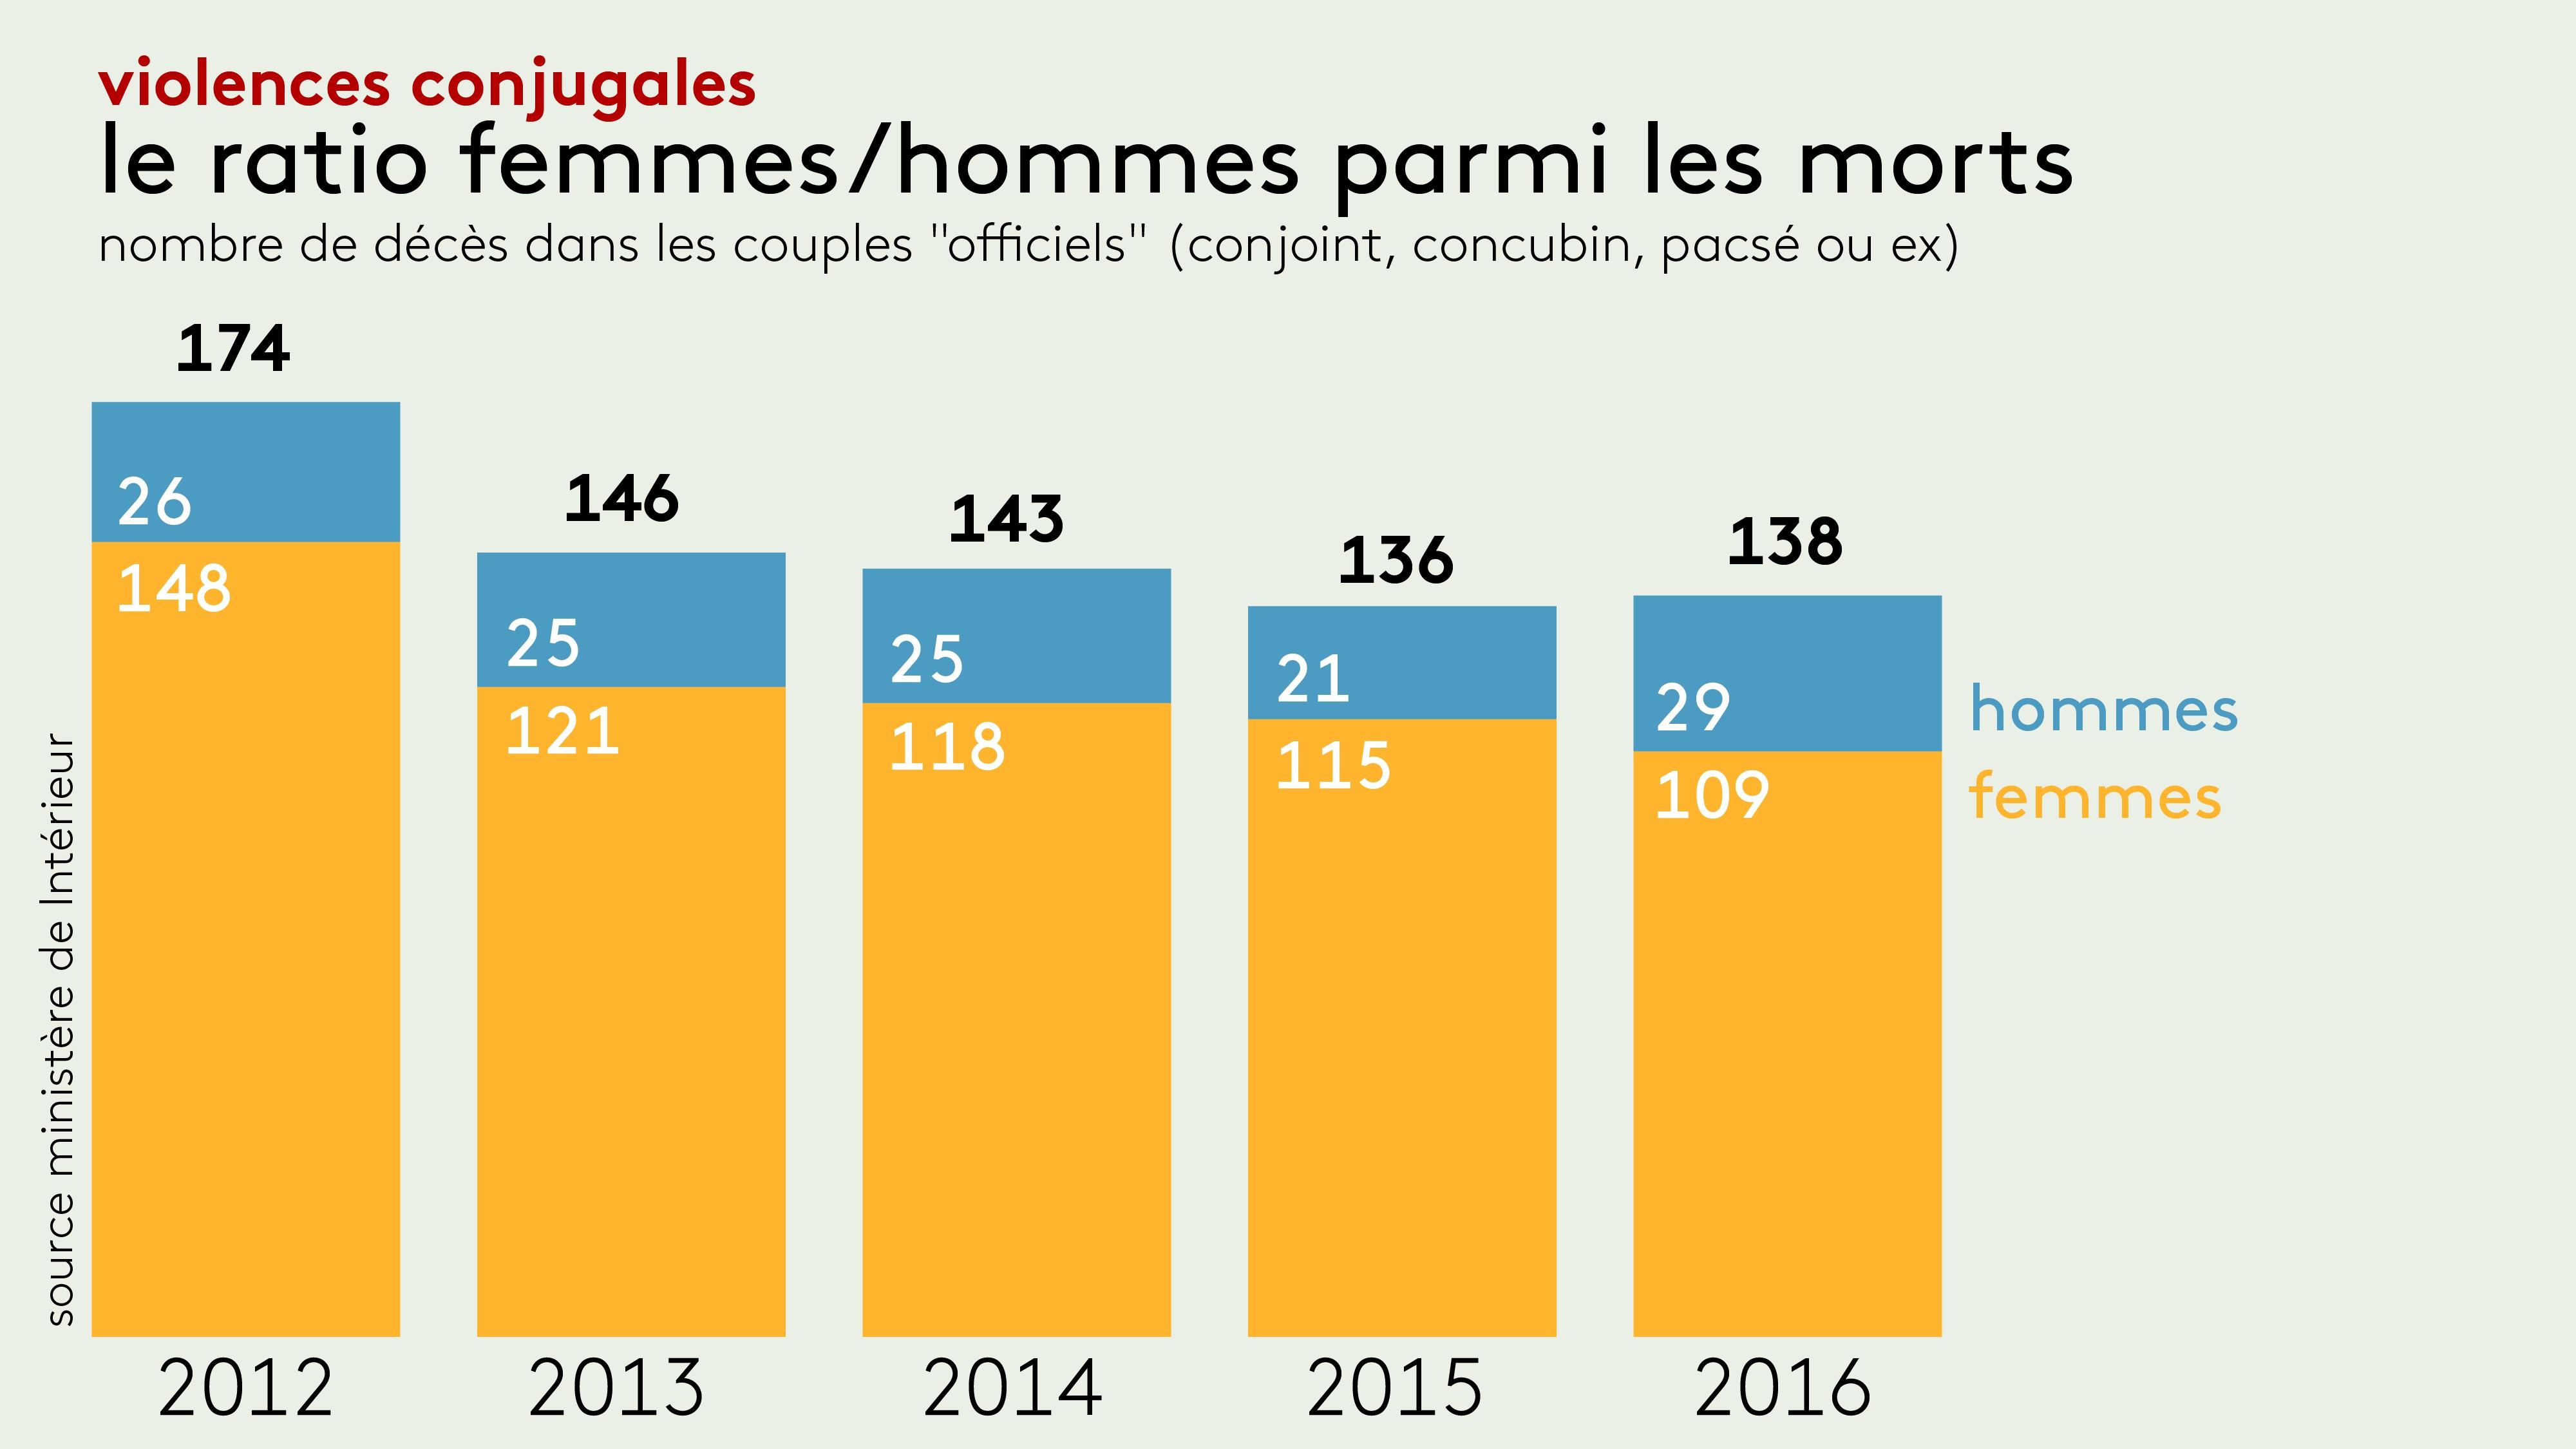 Le nombre de victimes de violences conjugales en France en 2016.